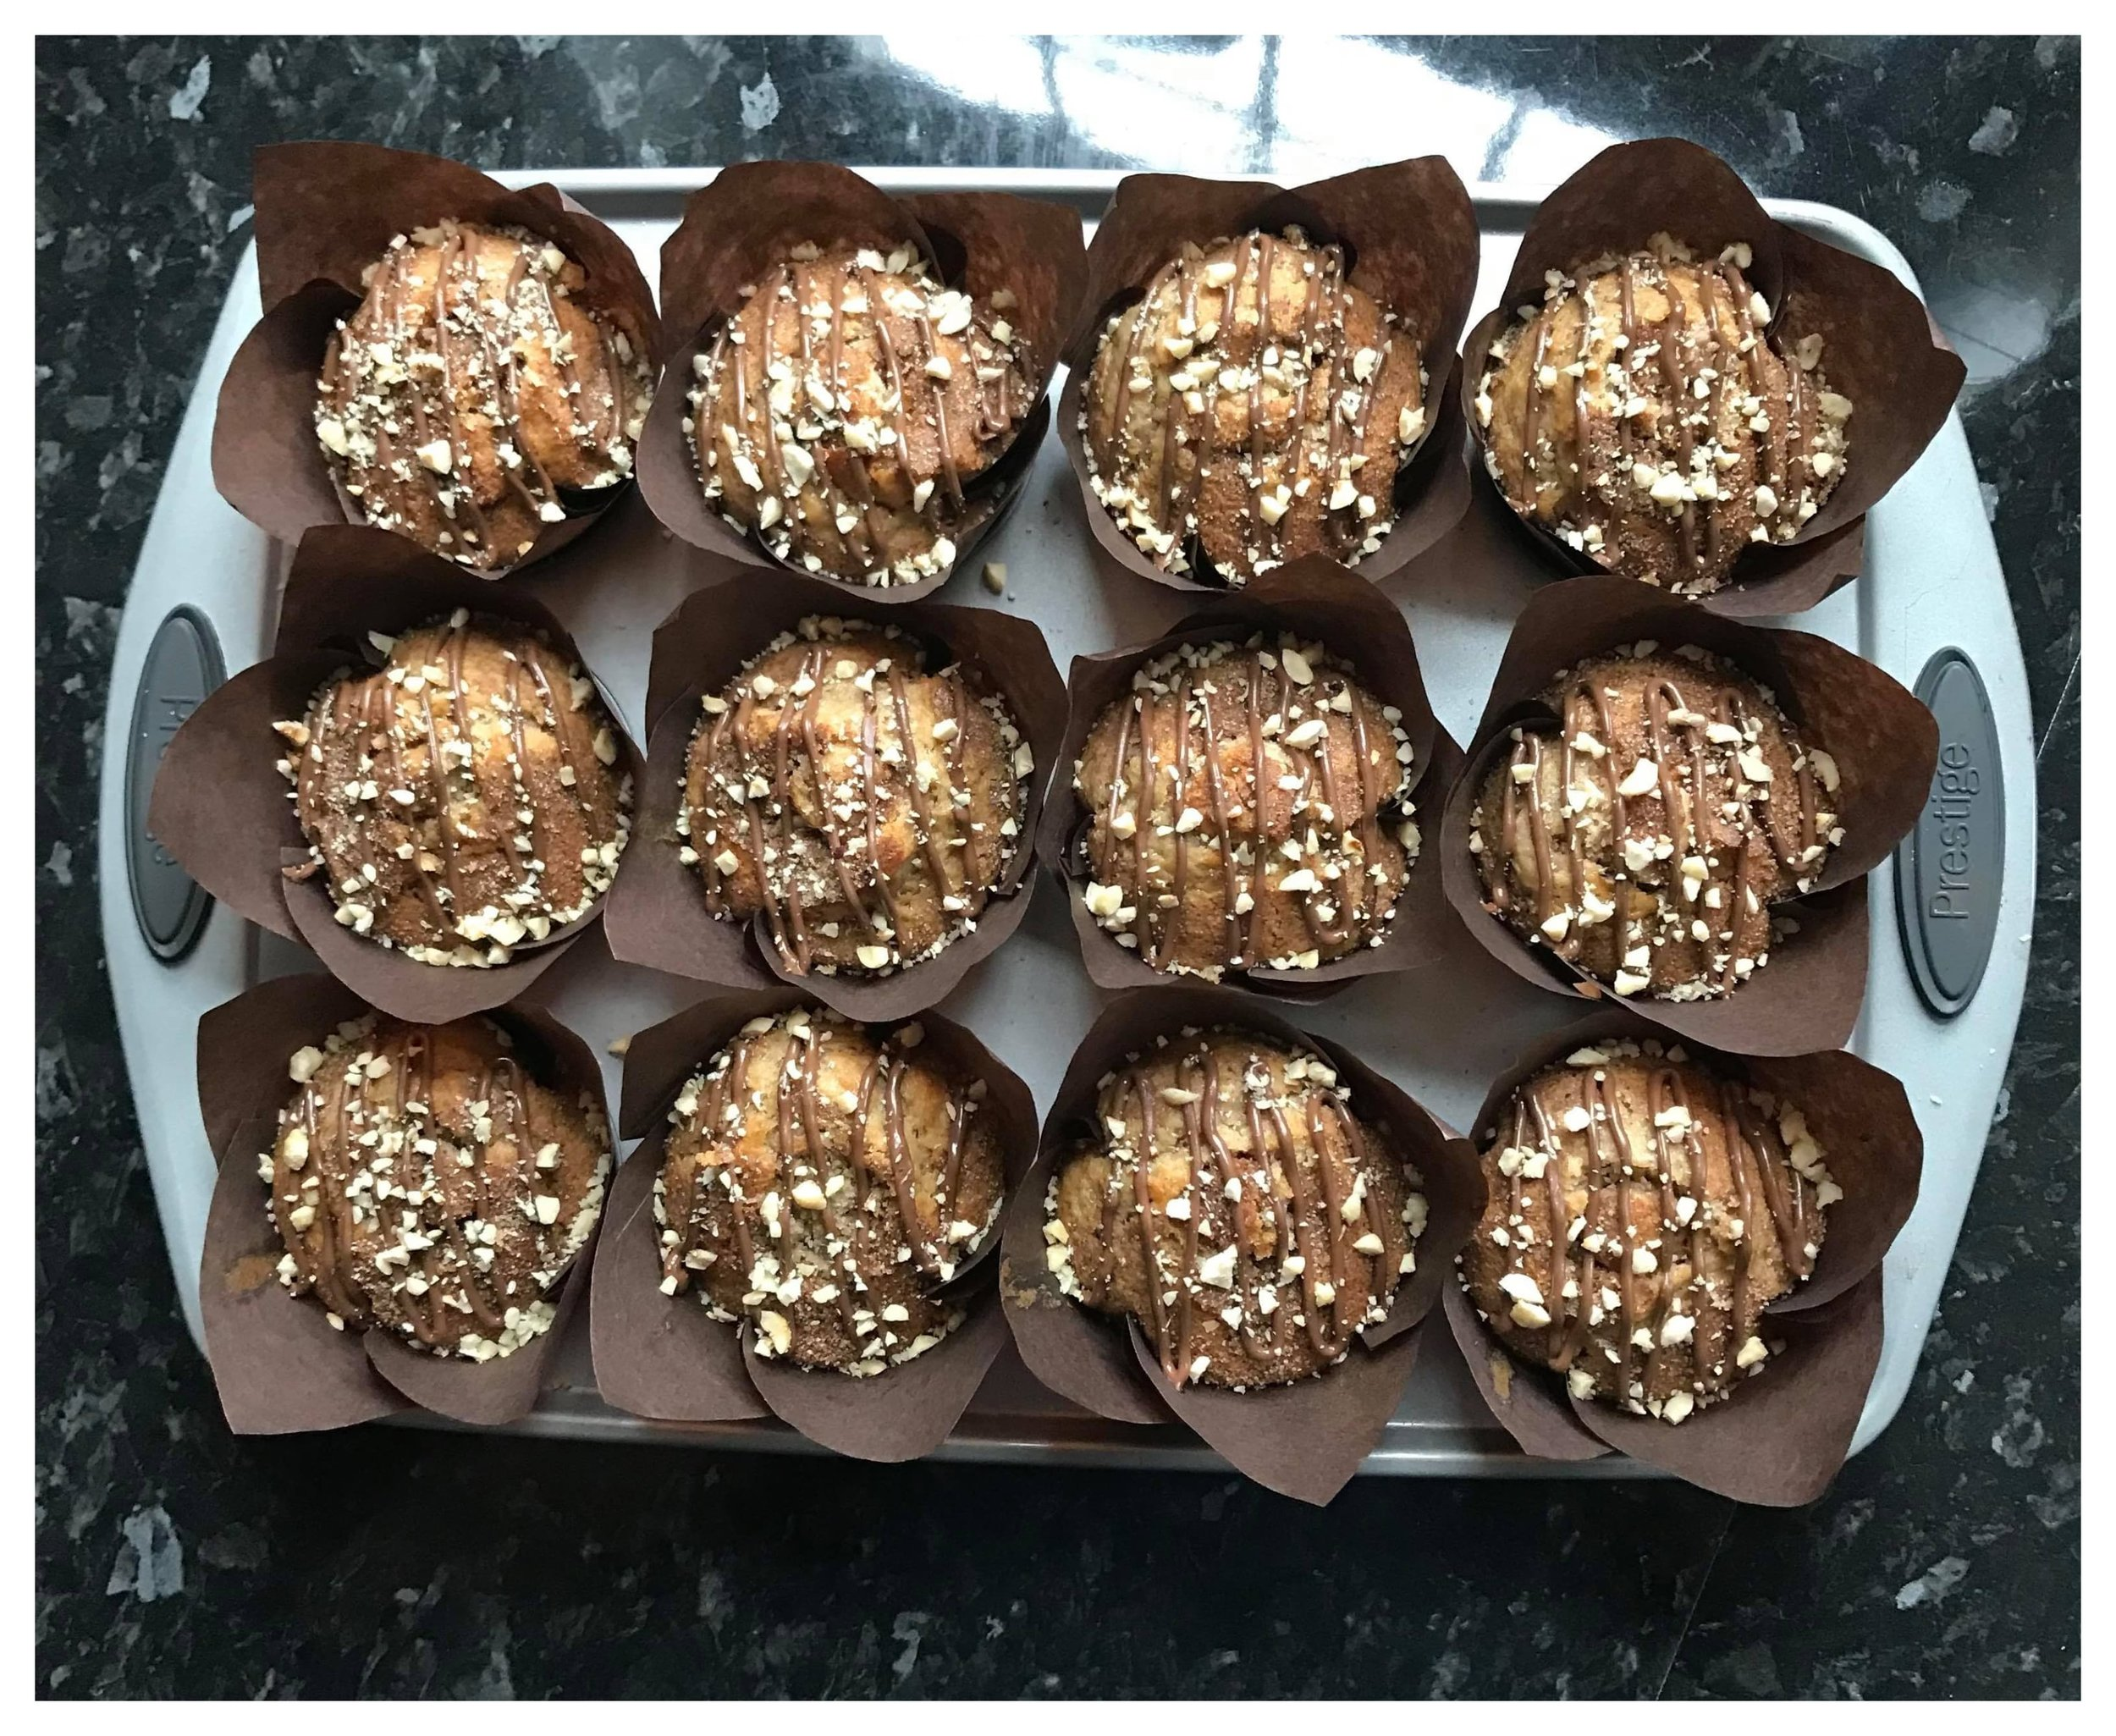 Nutella Stuffed Spiced Muffins